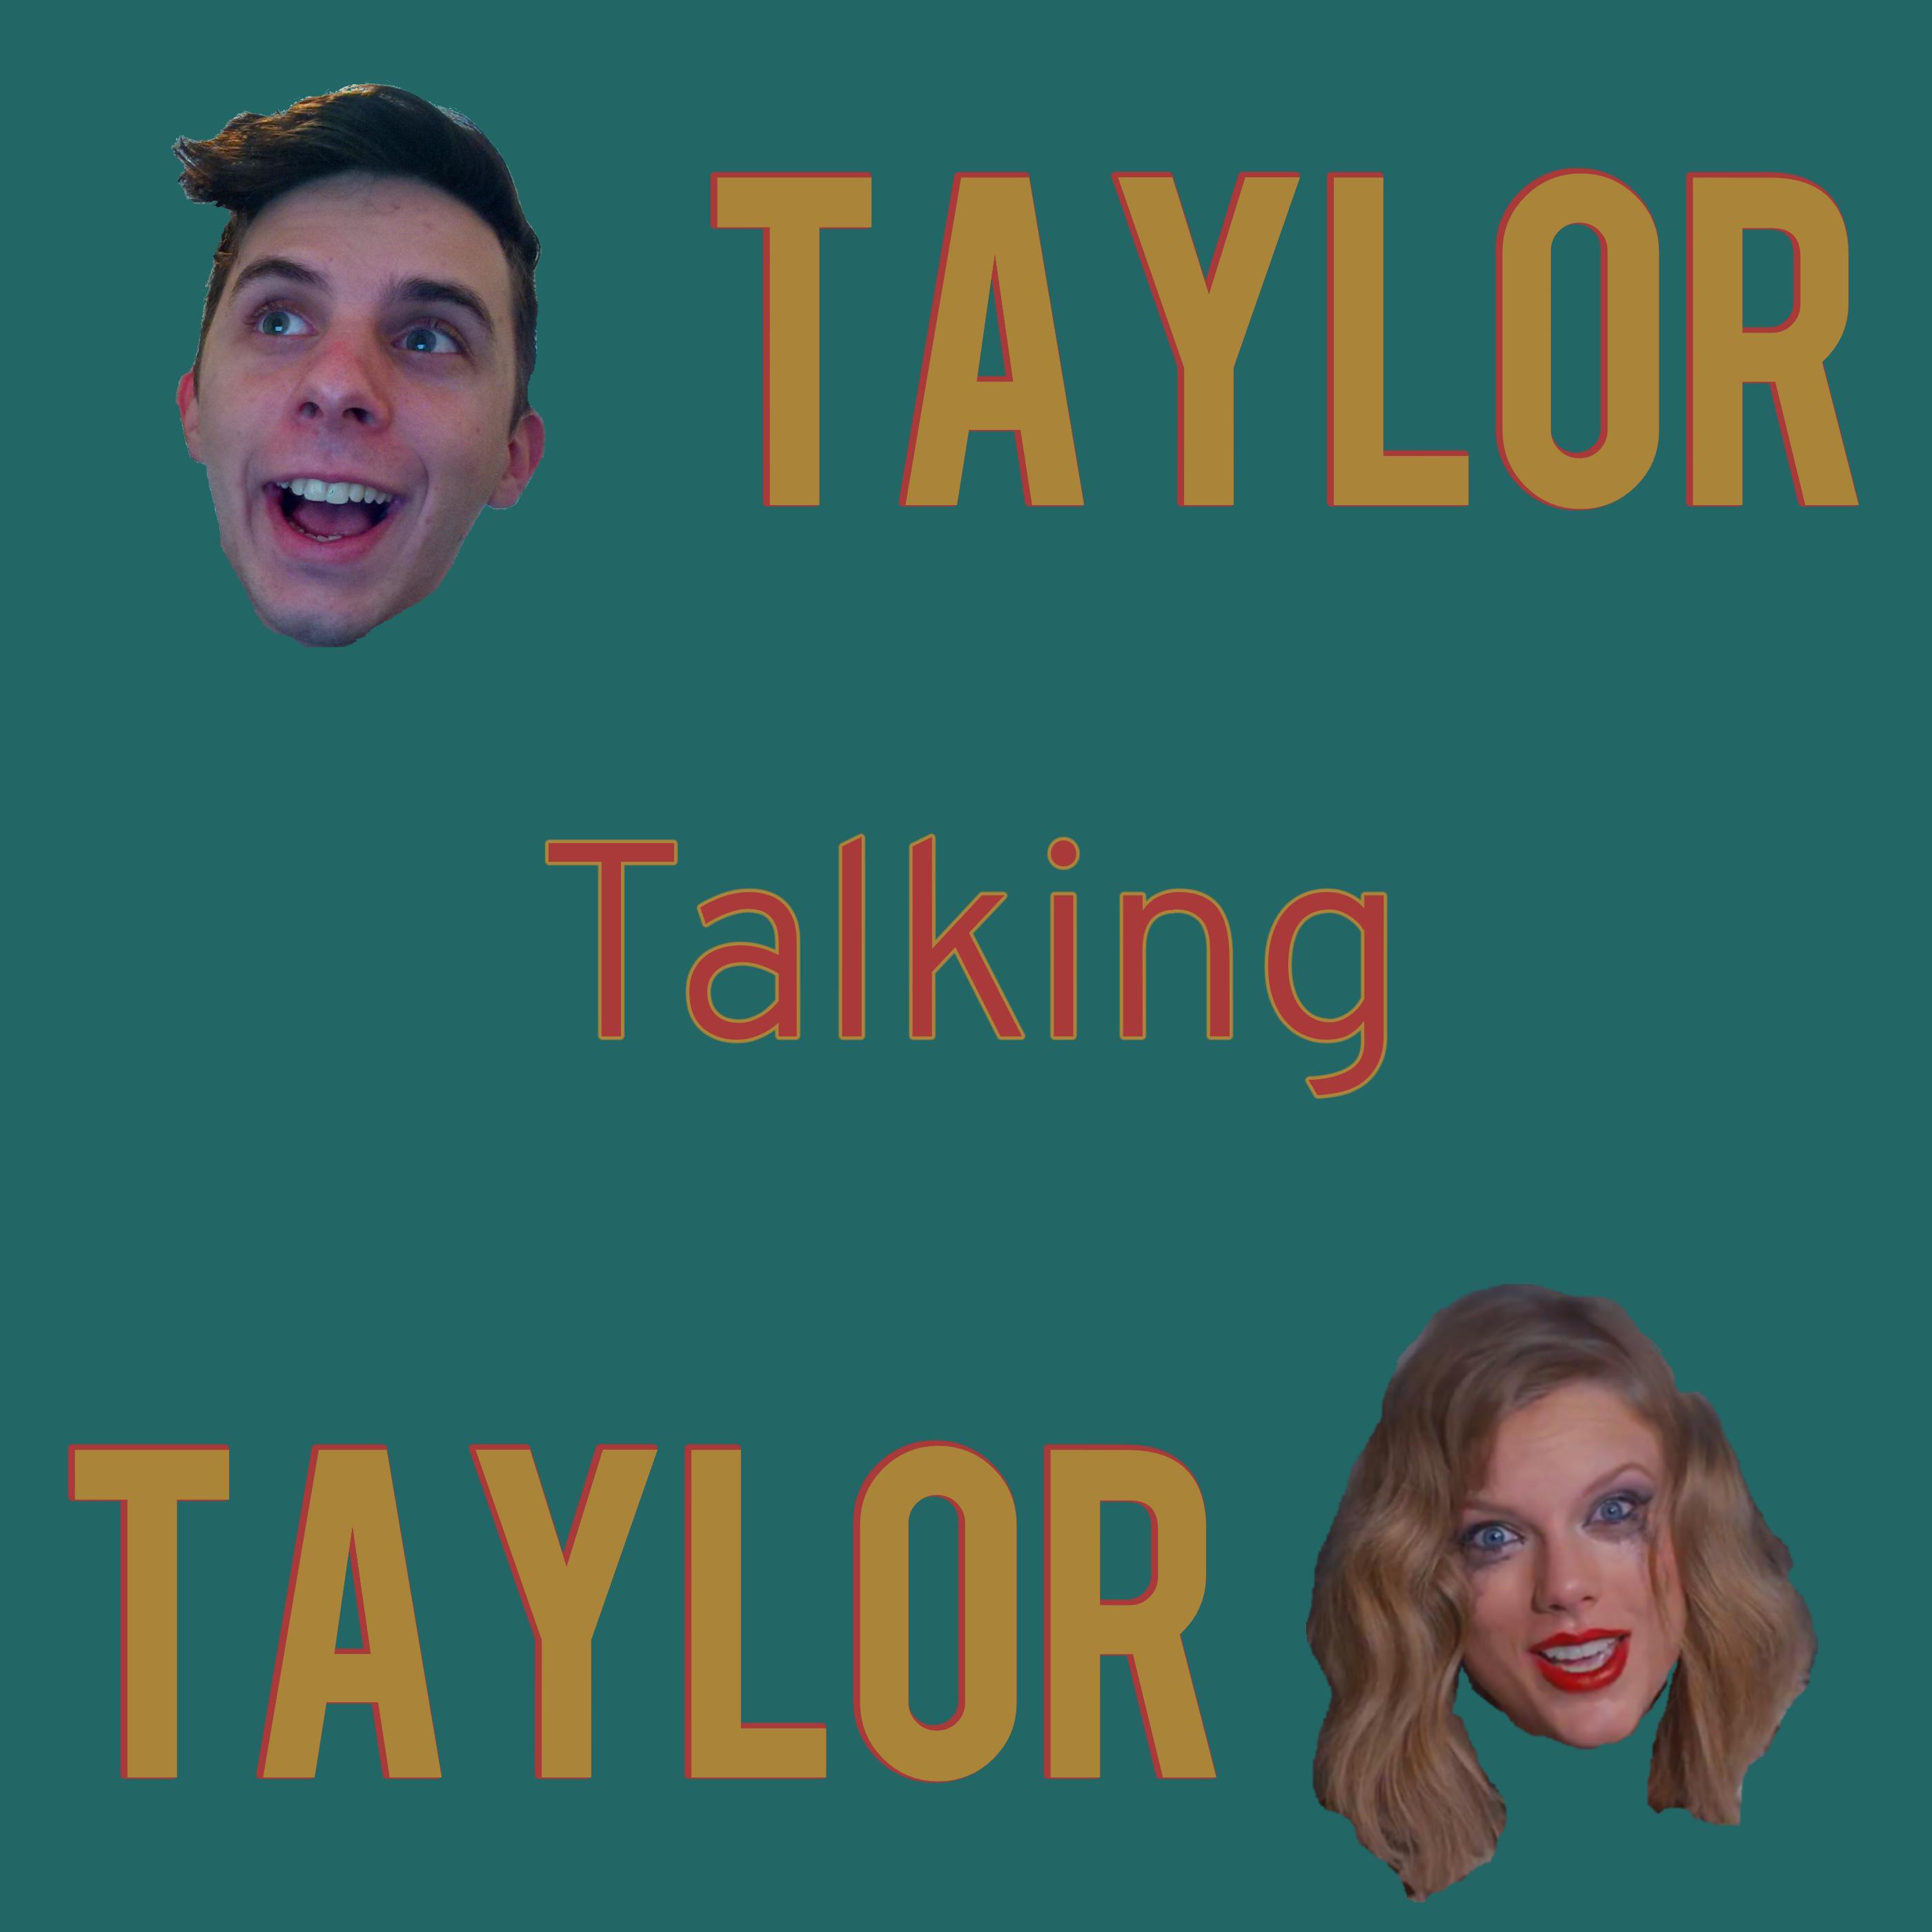 Taylor Talking Taylor logo